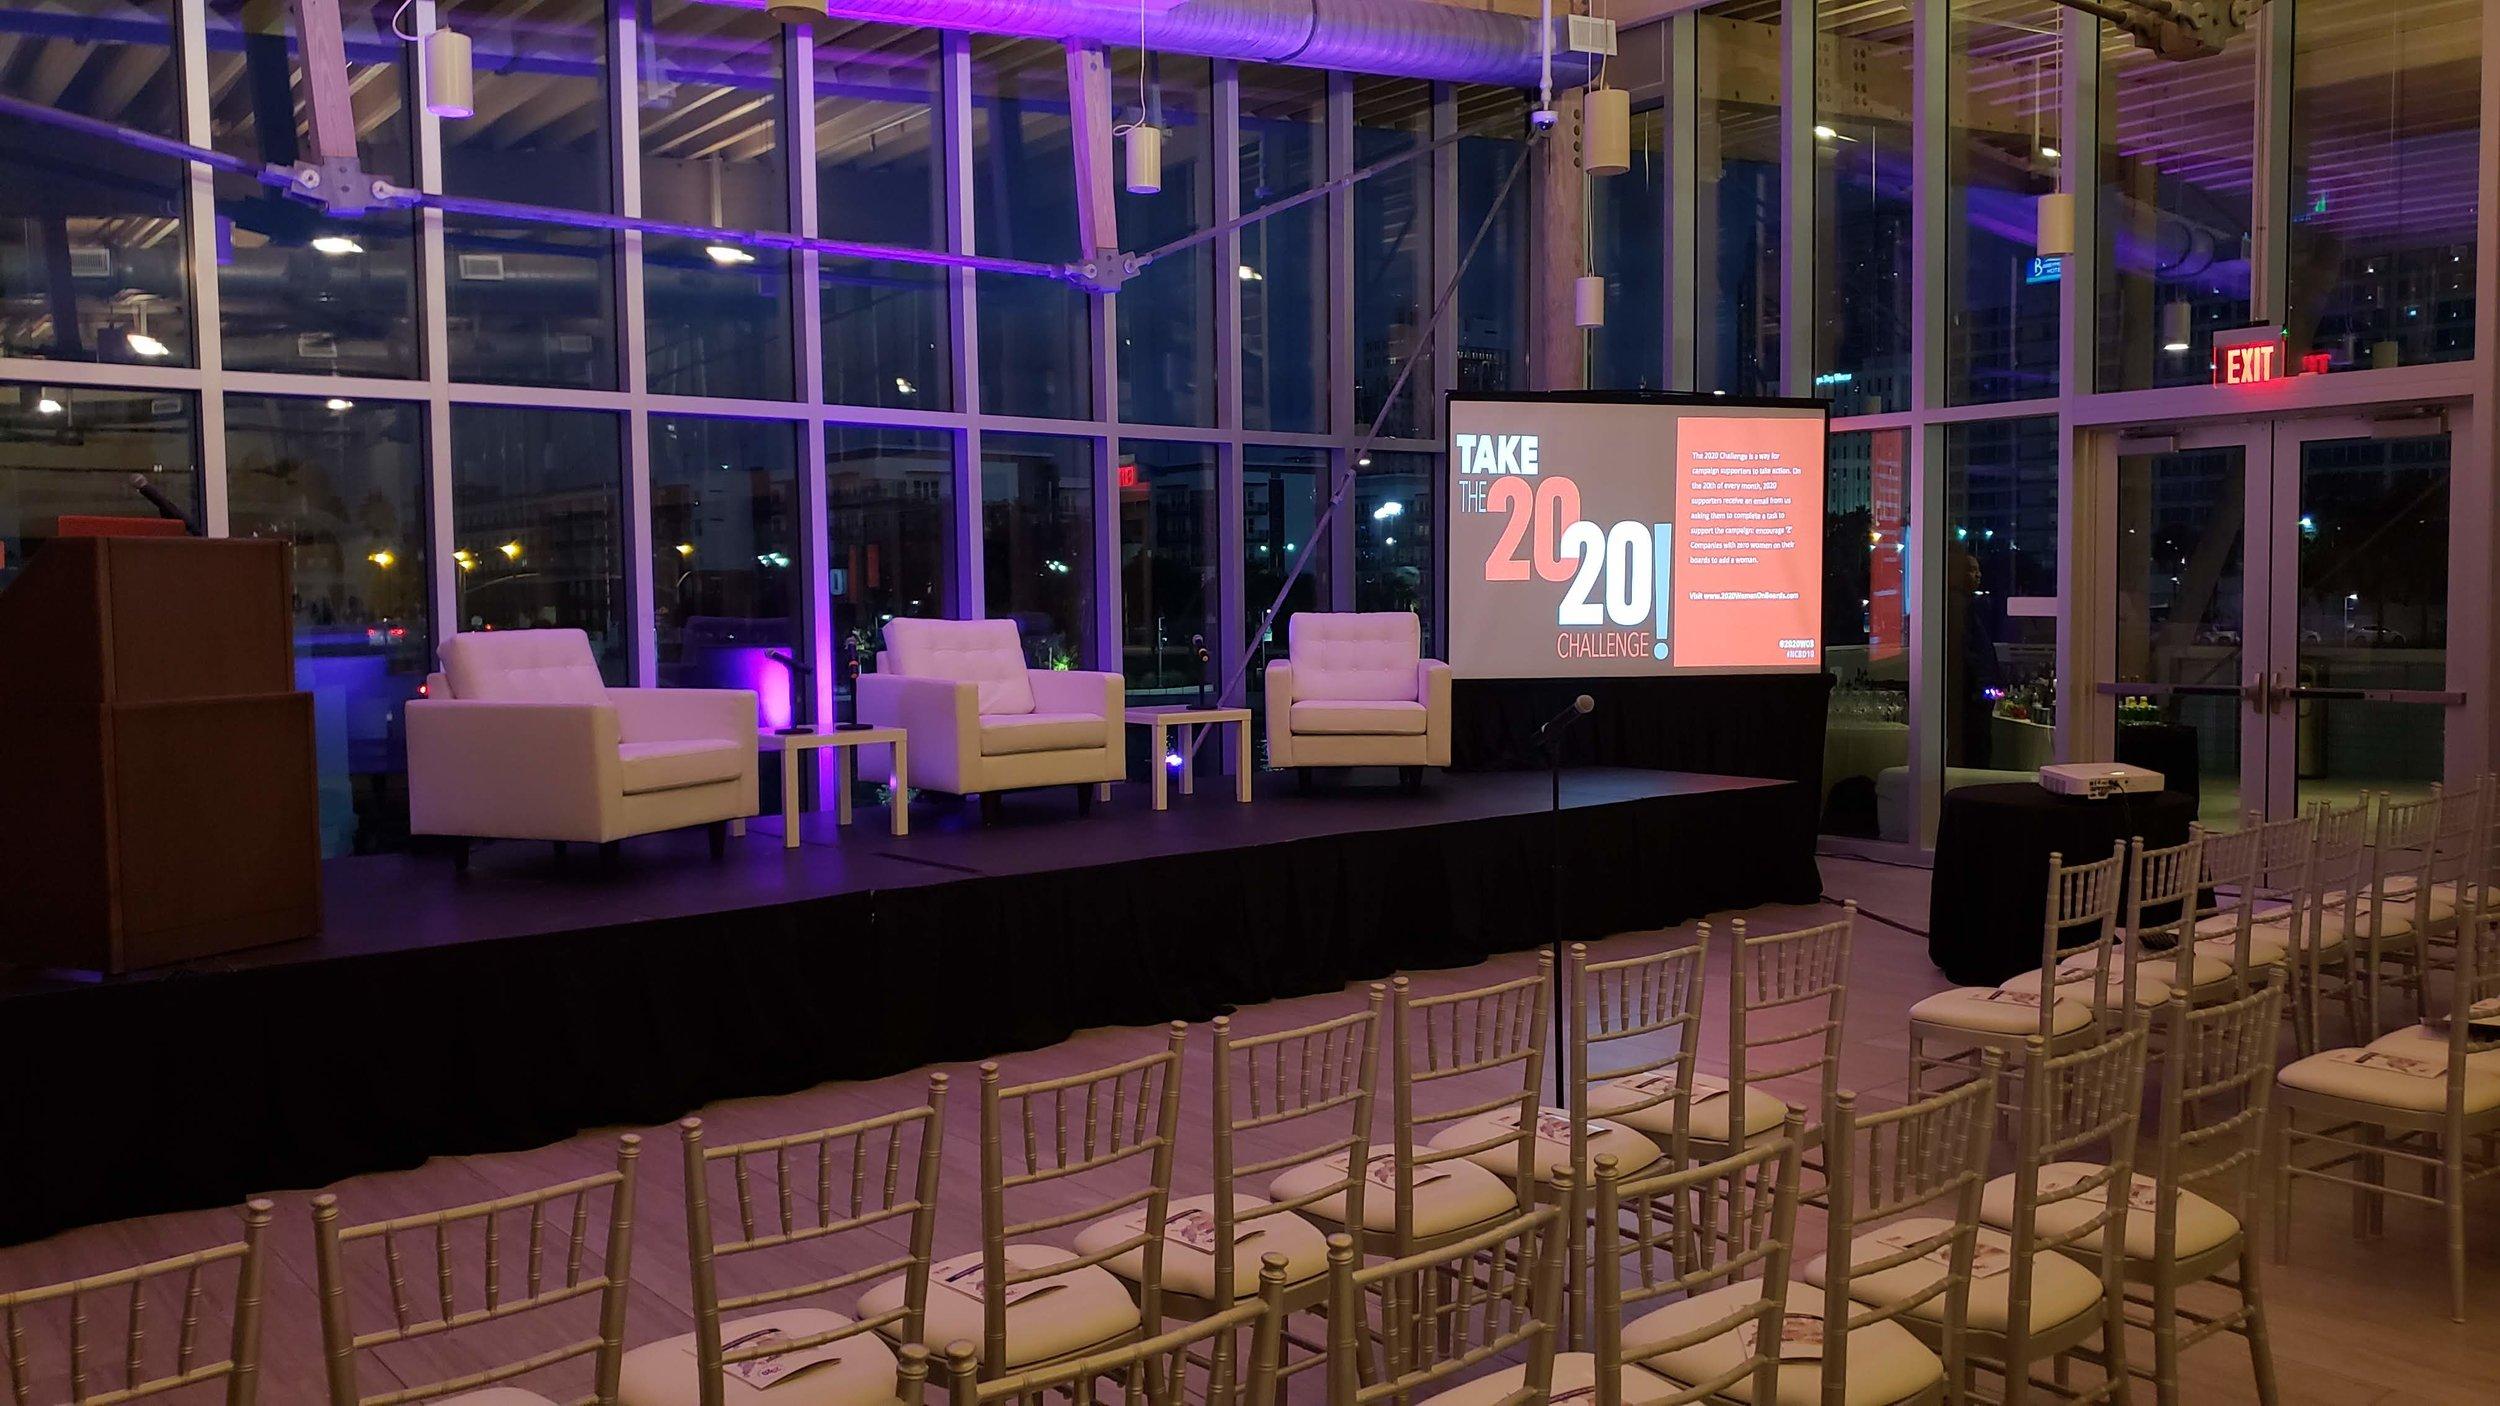 AV-Rentals-Riser-Panel-Chairs-Uplighting-Rentals-Tripod-Screen-Projector.jpg